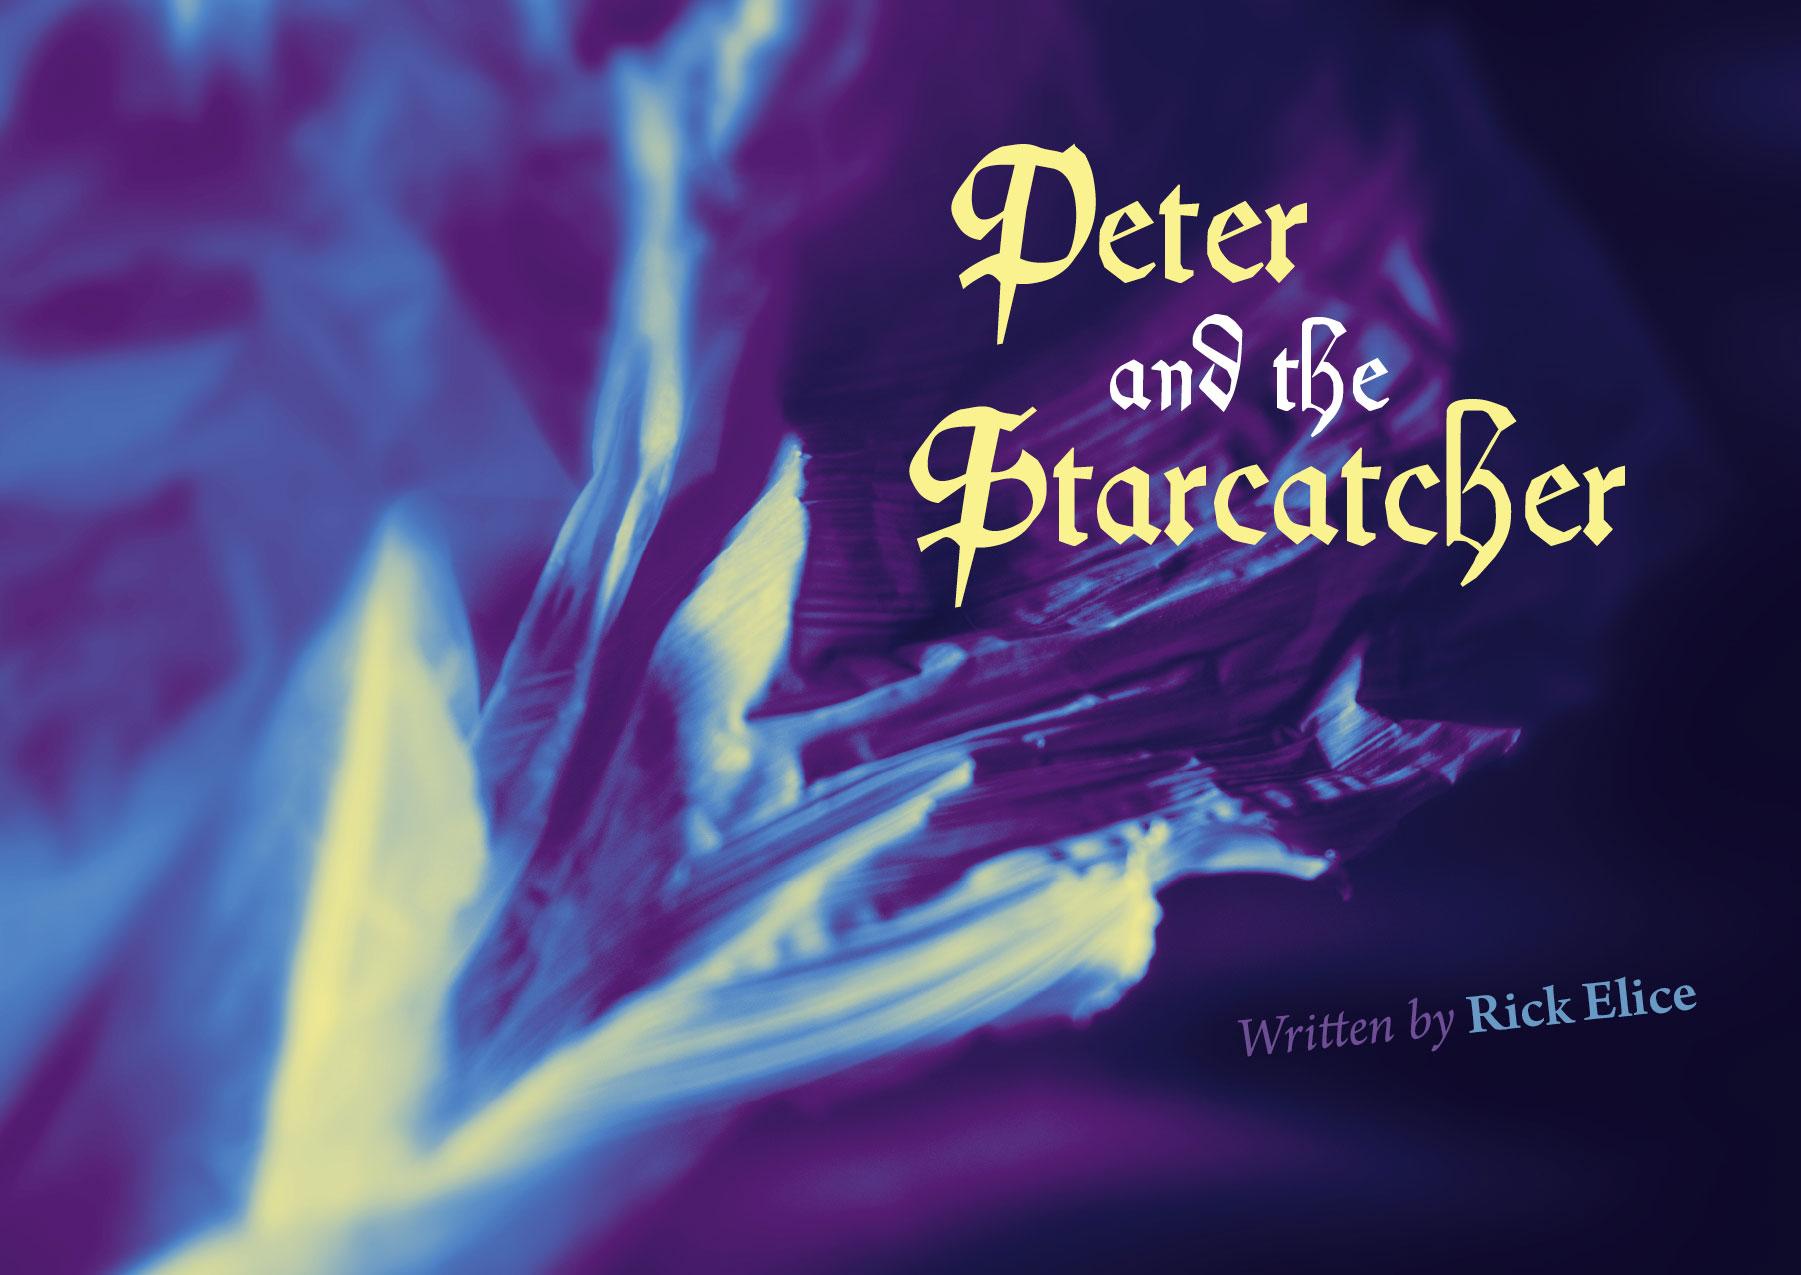 PeterStarCatcher2.jpg